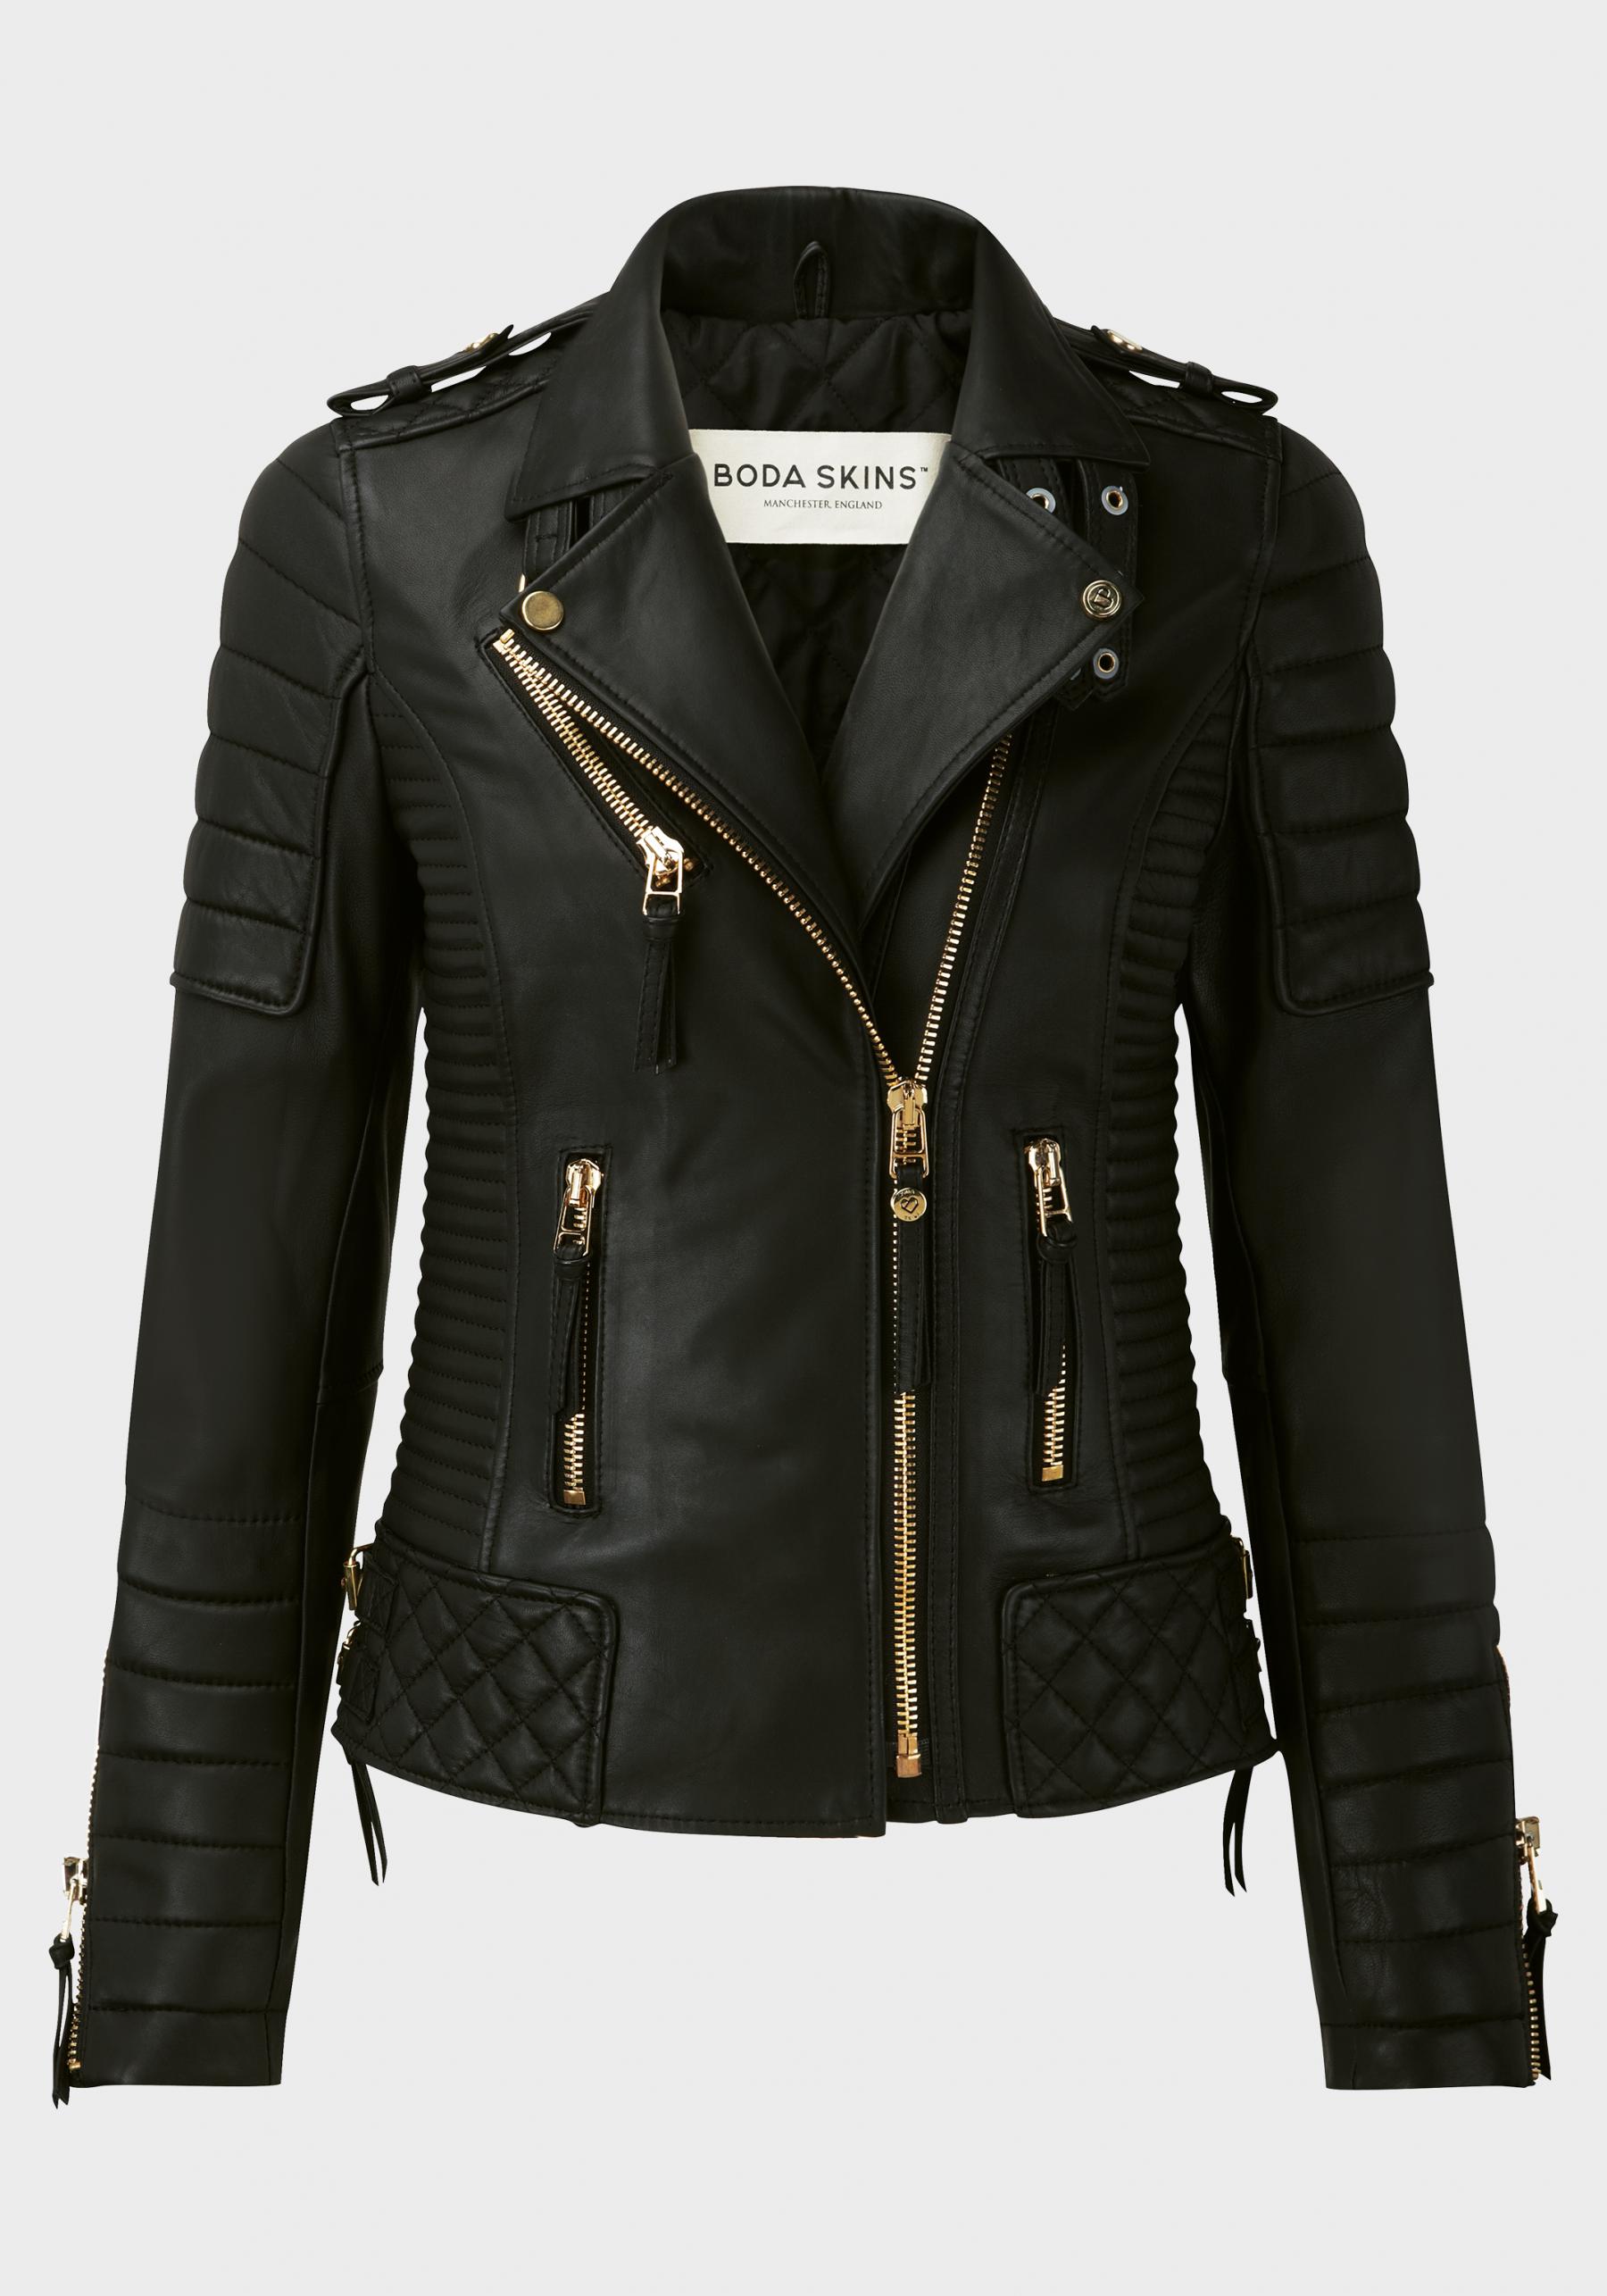 Kay Michaels Quilted Biker V.2 (Gold Hardware) - Jackets - Women -